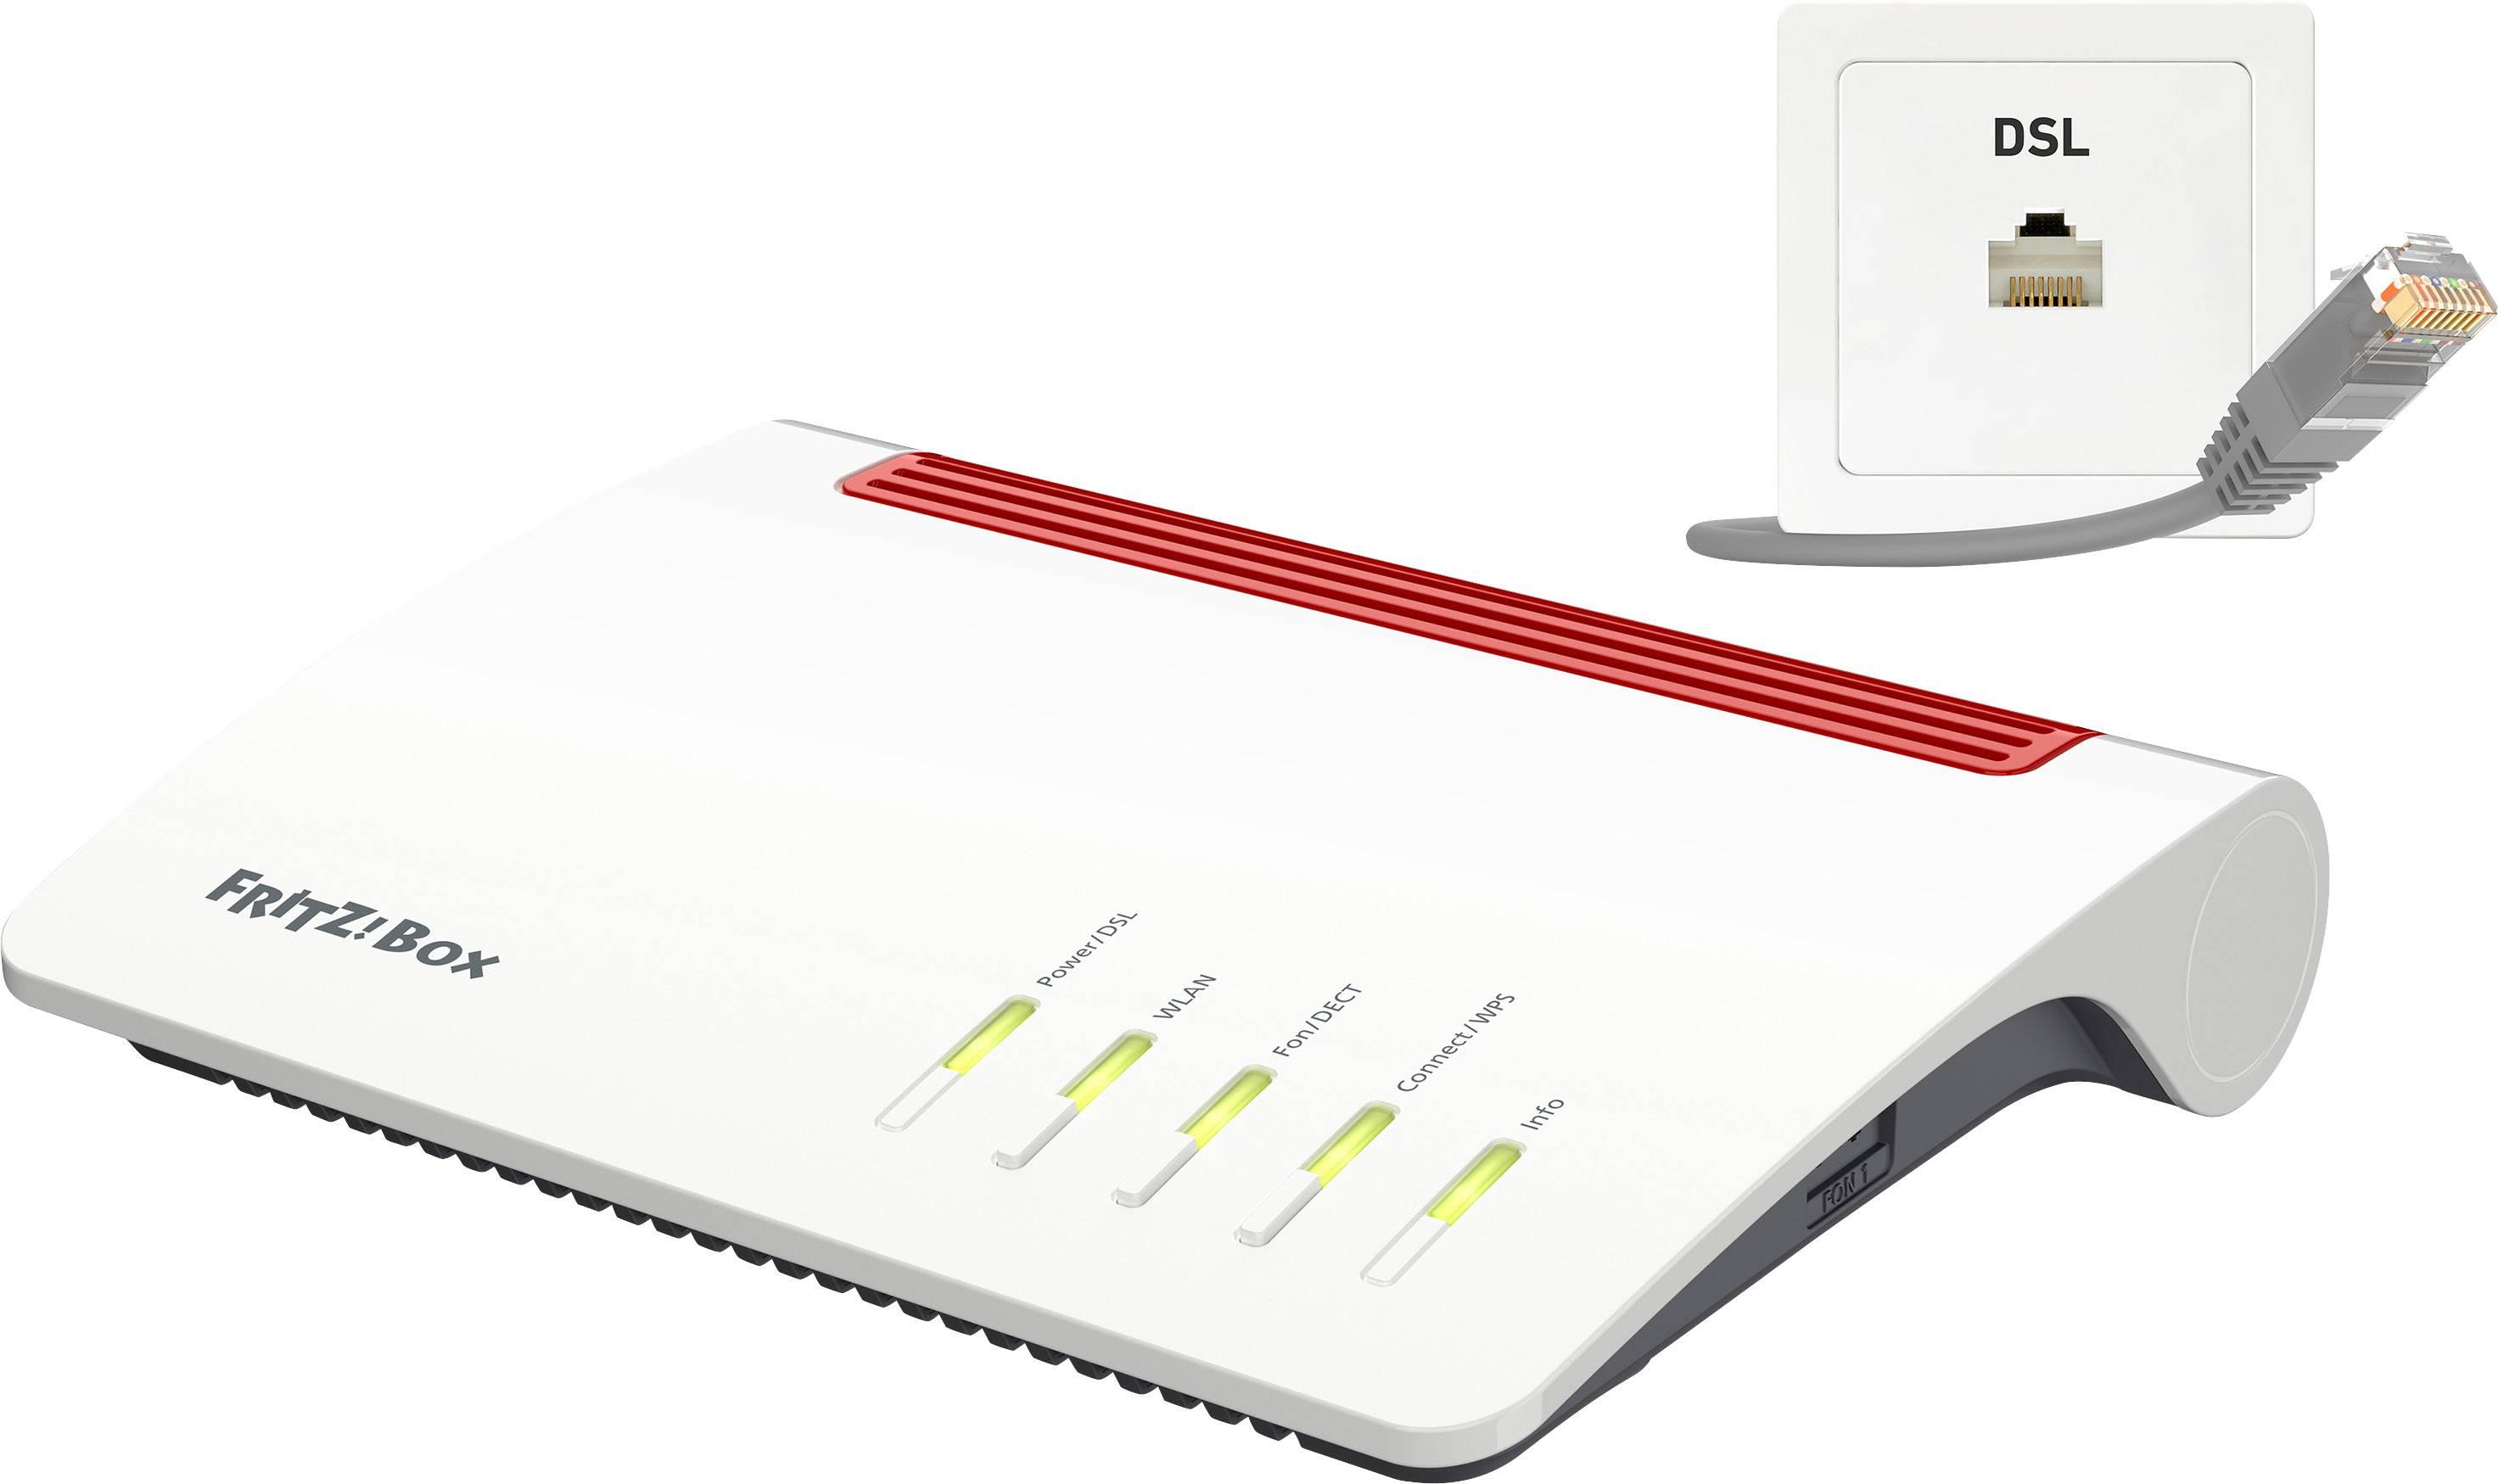 AVM FRITZBox 2000 A/CH Wi Fi modem router Built in modem VDSL, ADSL 200.200  GHz, 200 GHz 200.20033 MBps